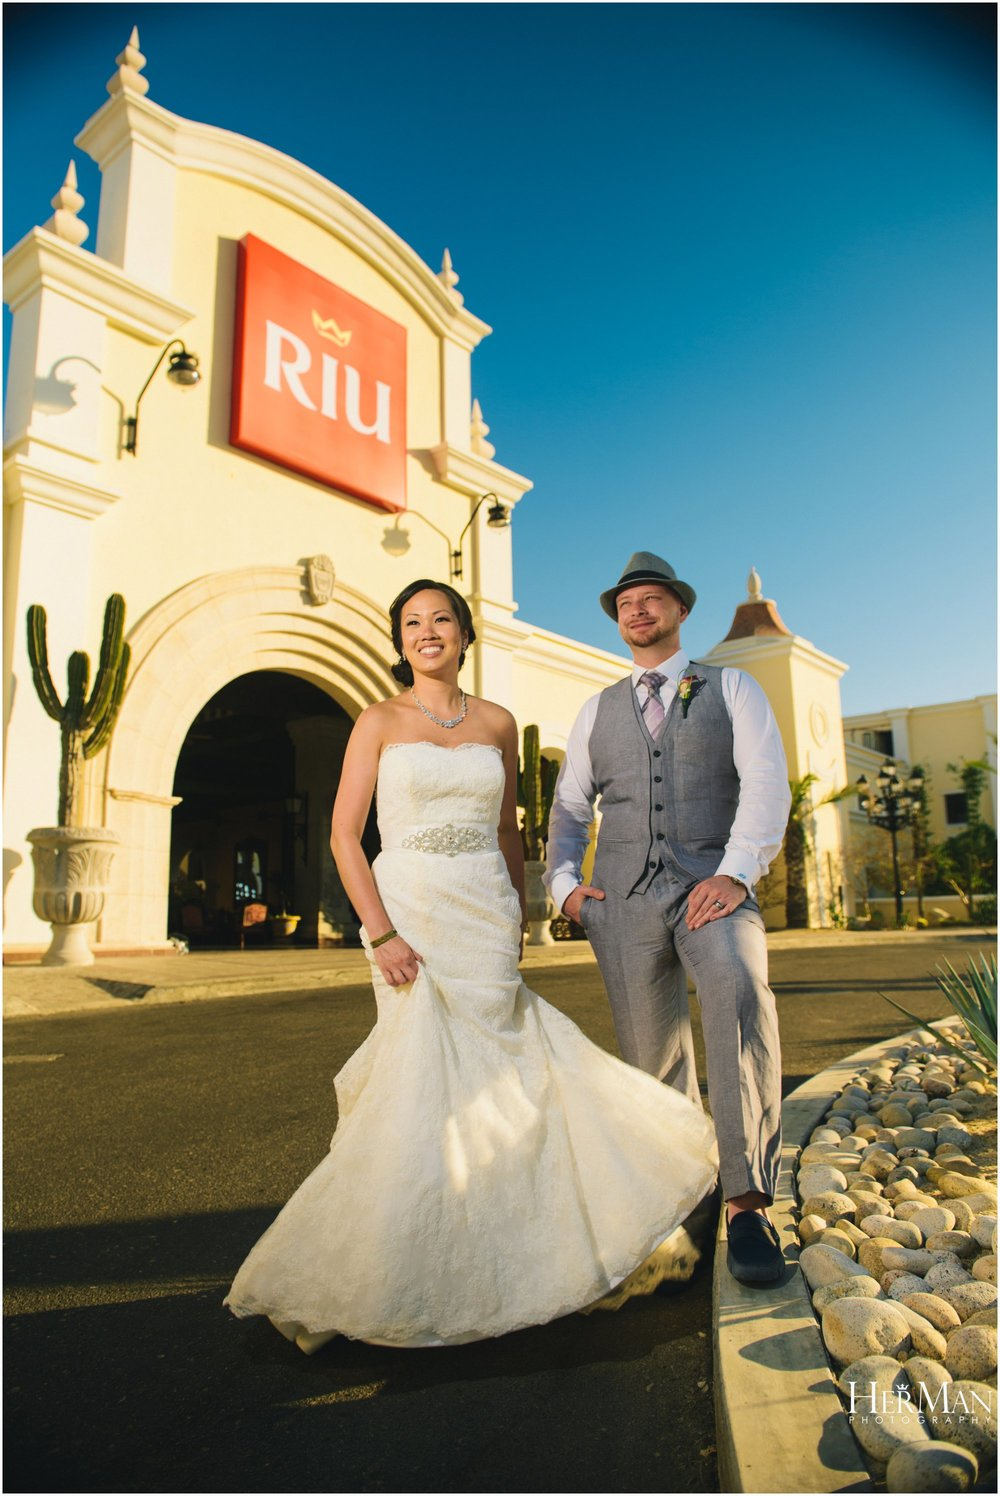 Destination-Wedding-Wedding-Herman-Photography_0022.jpg